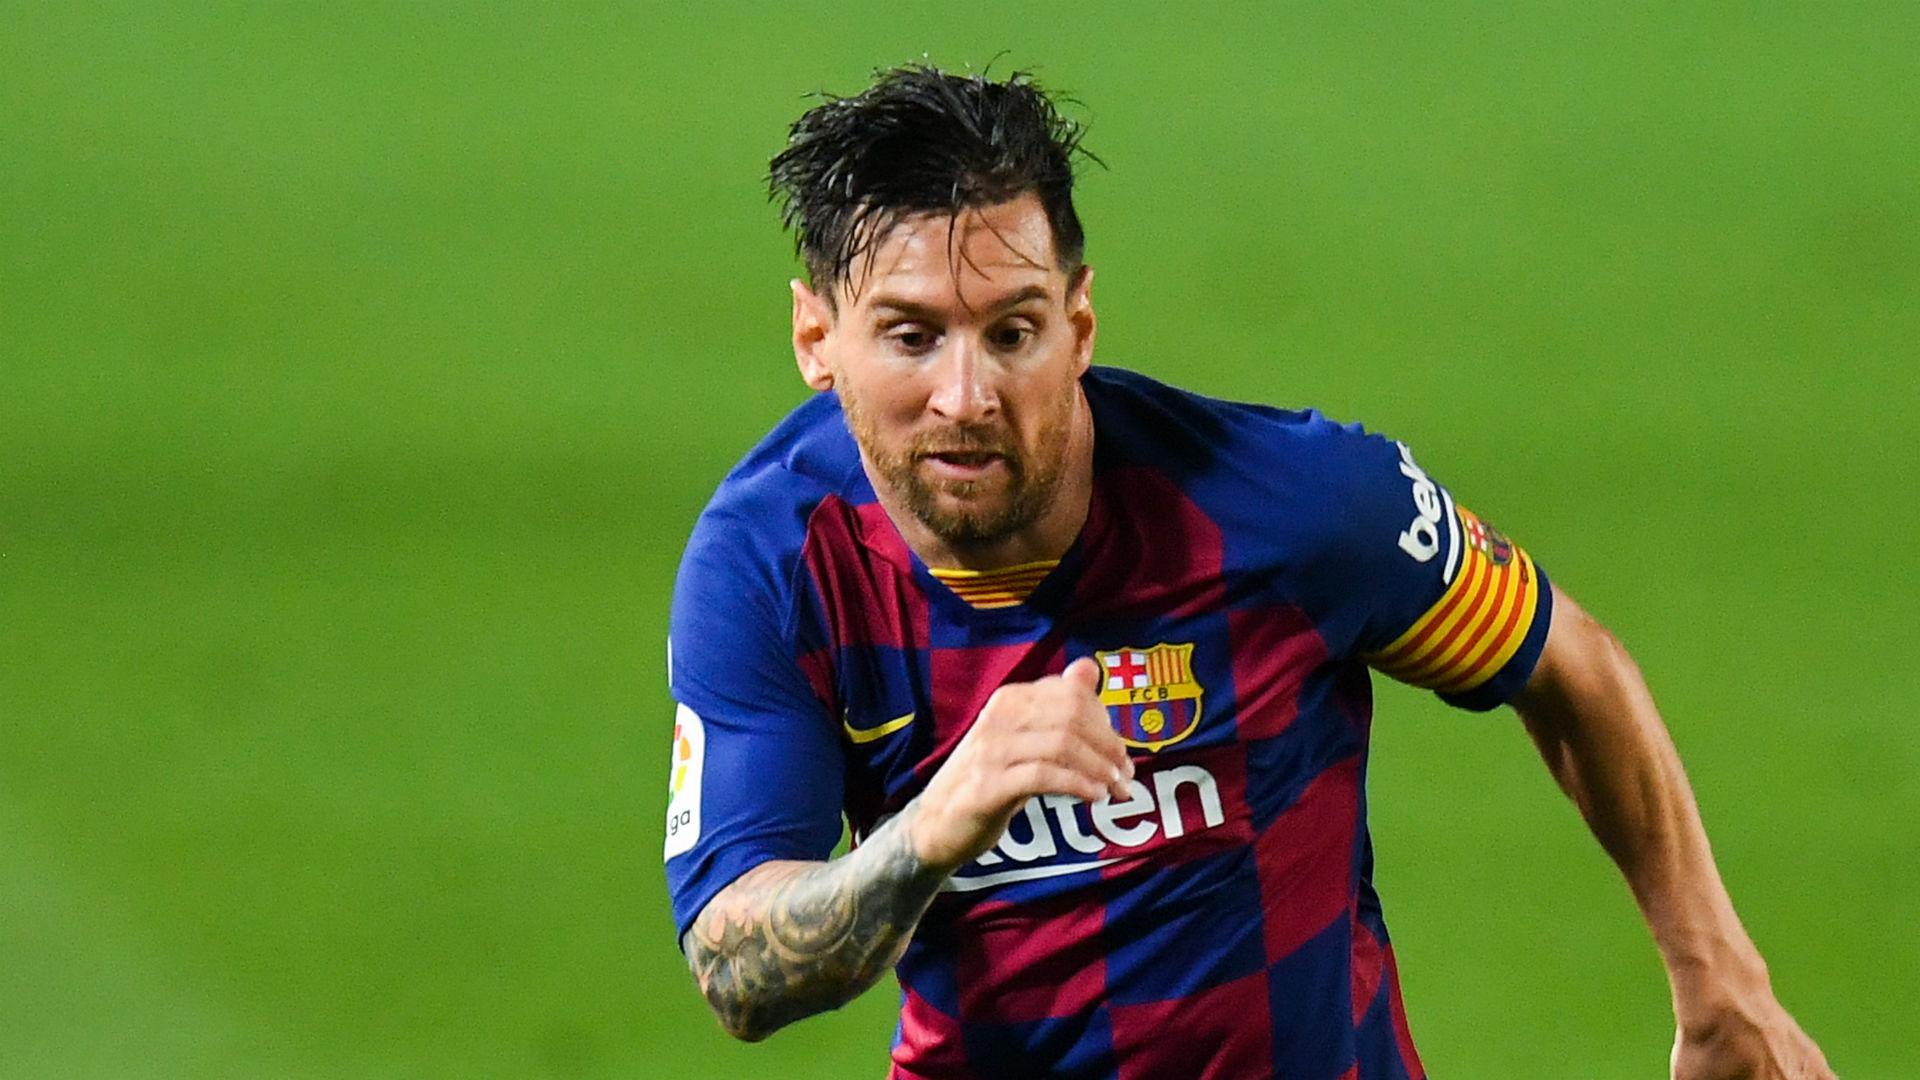 Messi will play wherever he wants, says Pochettino